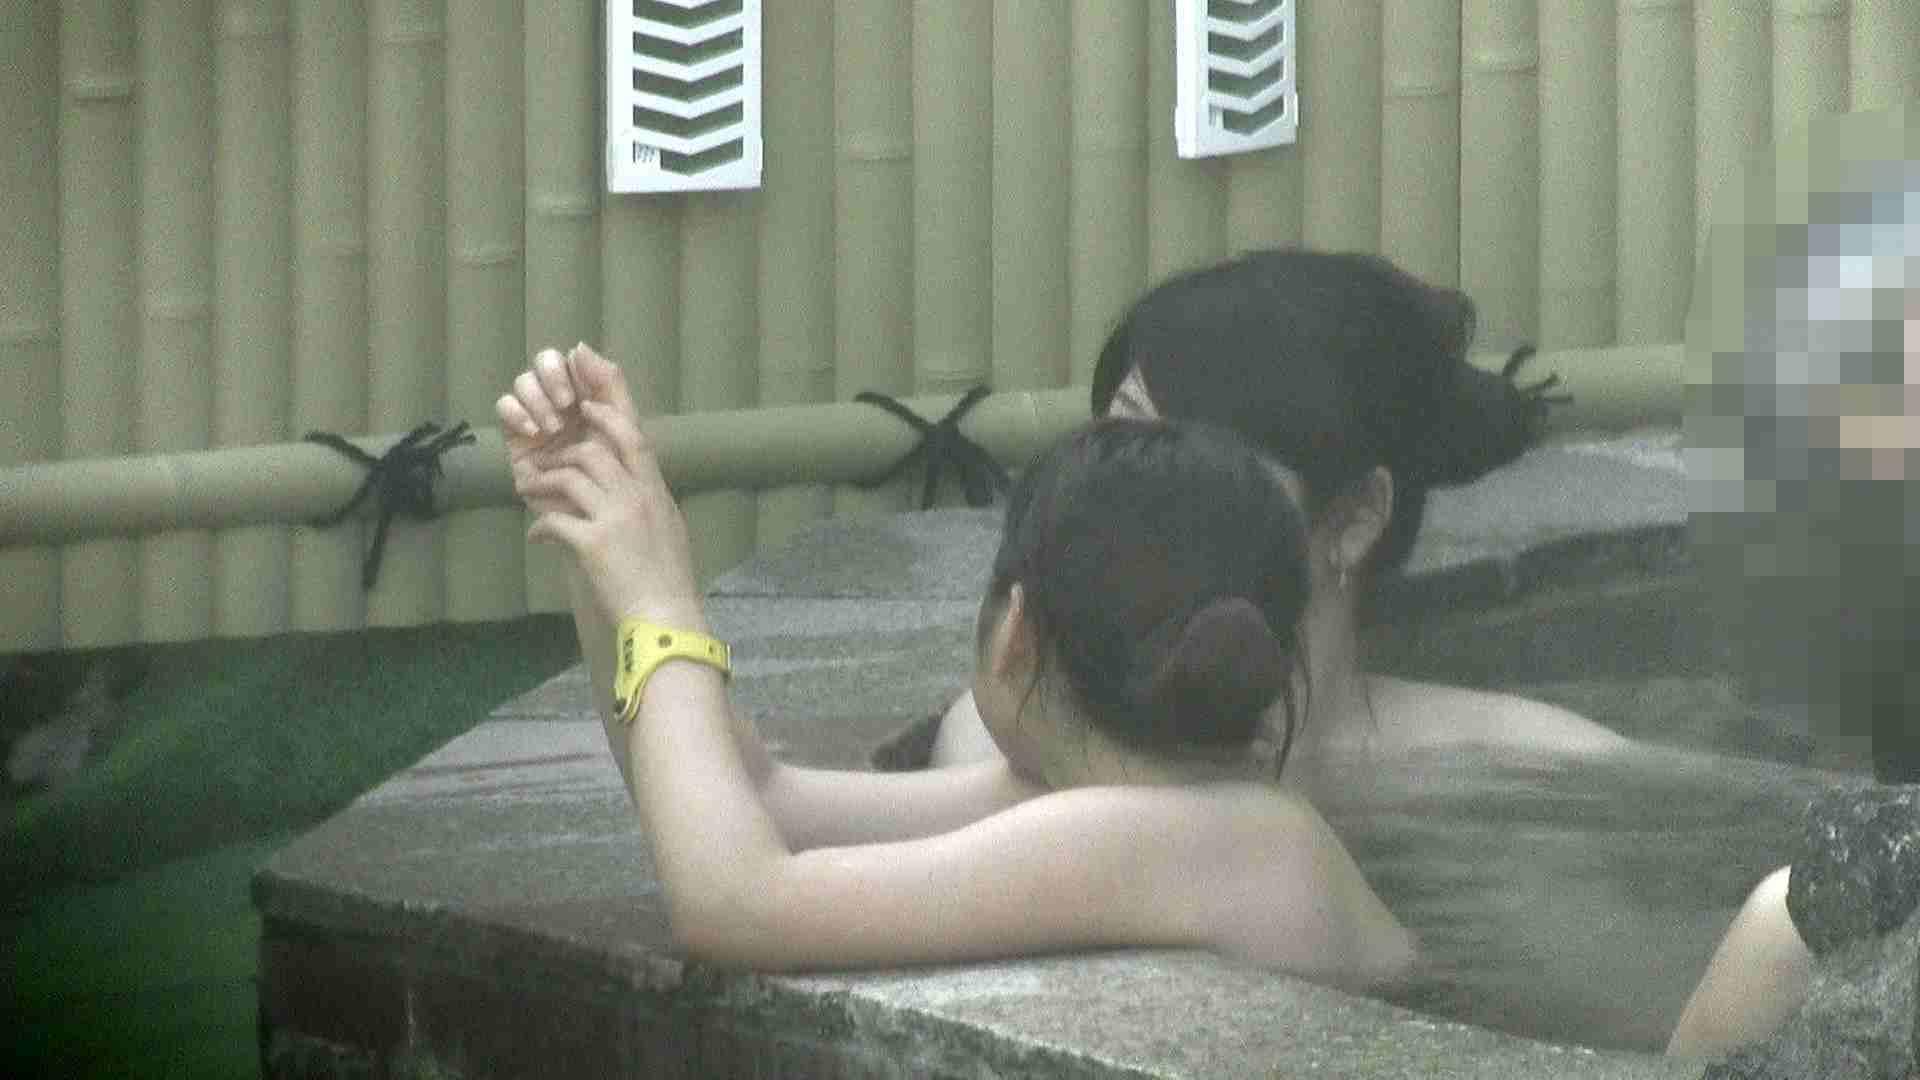 Aquaな露天風呂Vol.206 露天 エロ画像 59連発 27